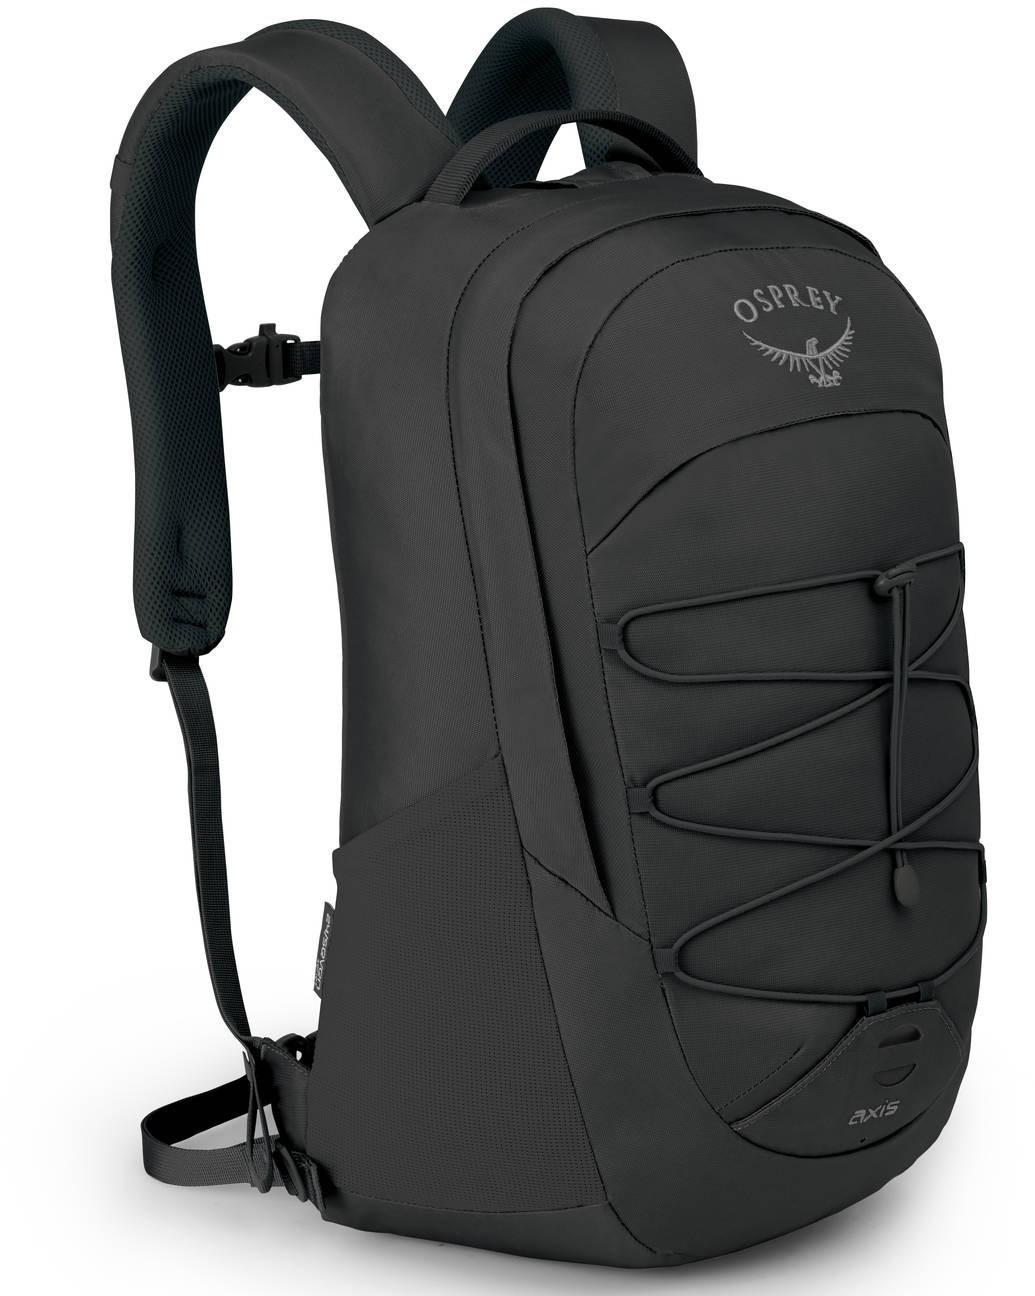 Городские рюкзаки Рюкзак Osprey Axis 18 Sentinel Grey Axis_F19_Side_Sentinel_Grey_web.jpg